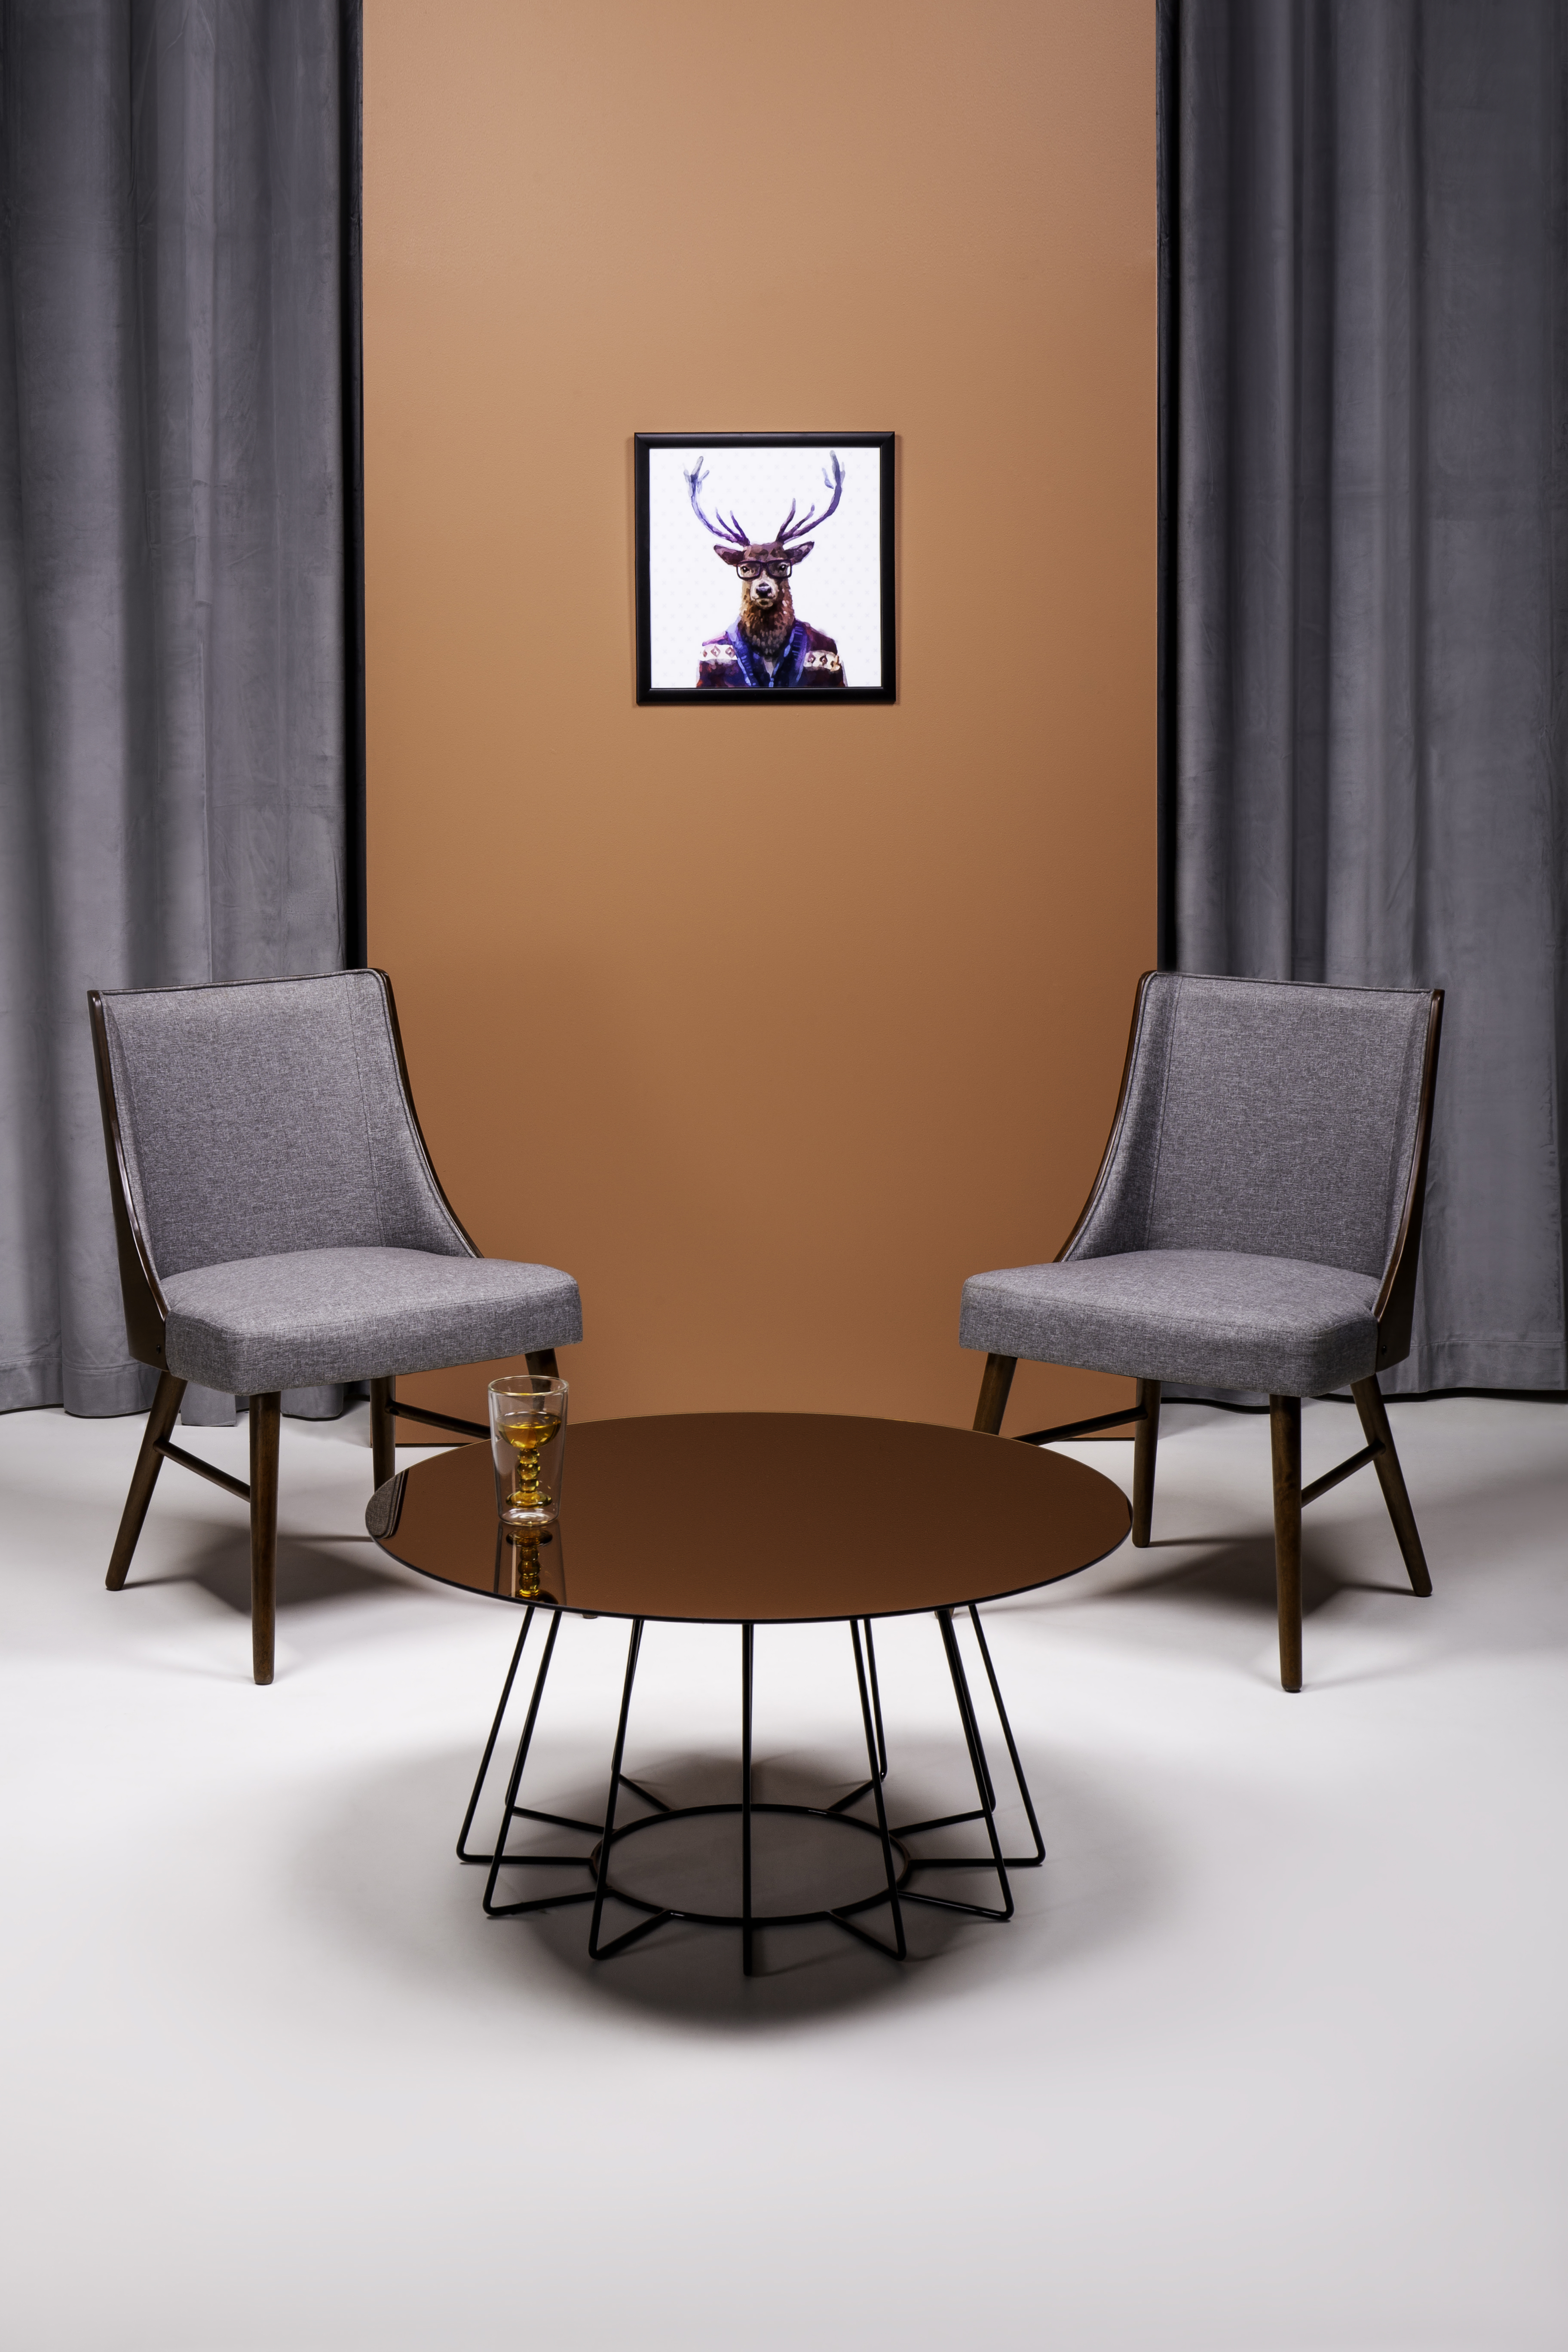 moblum_Hot-Sale-2019-ofertas-en-muebles-de-diseño_sillones